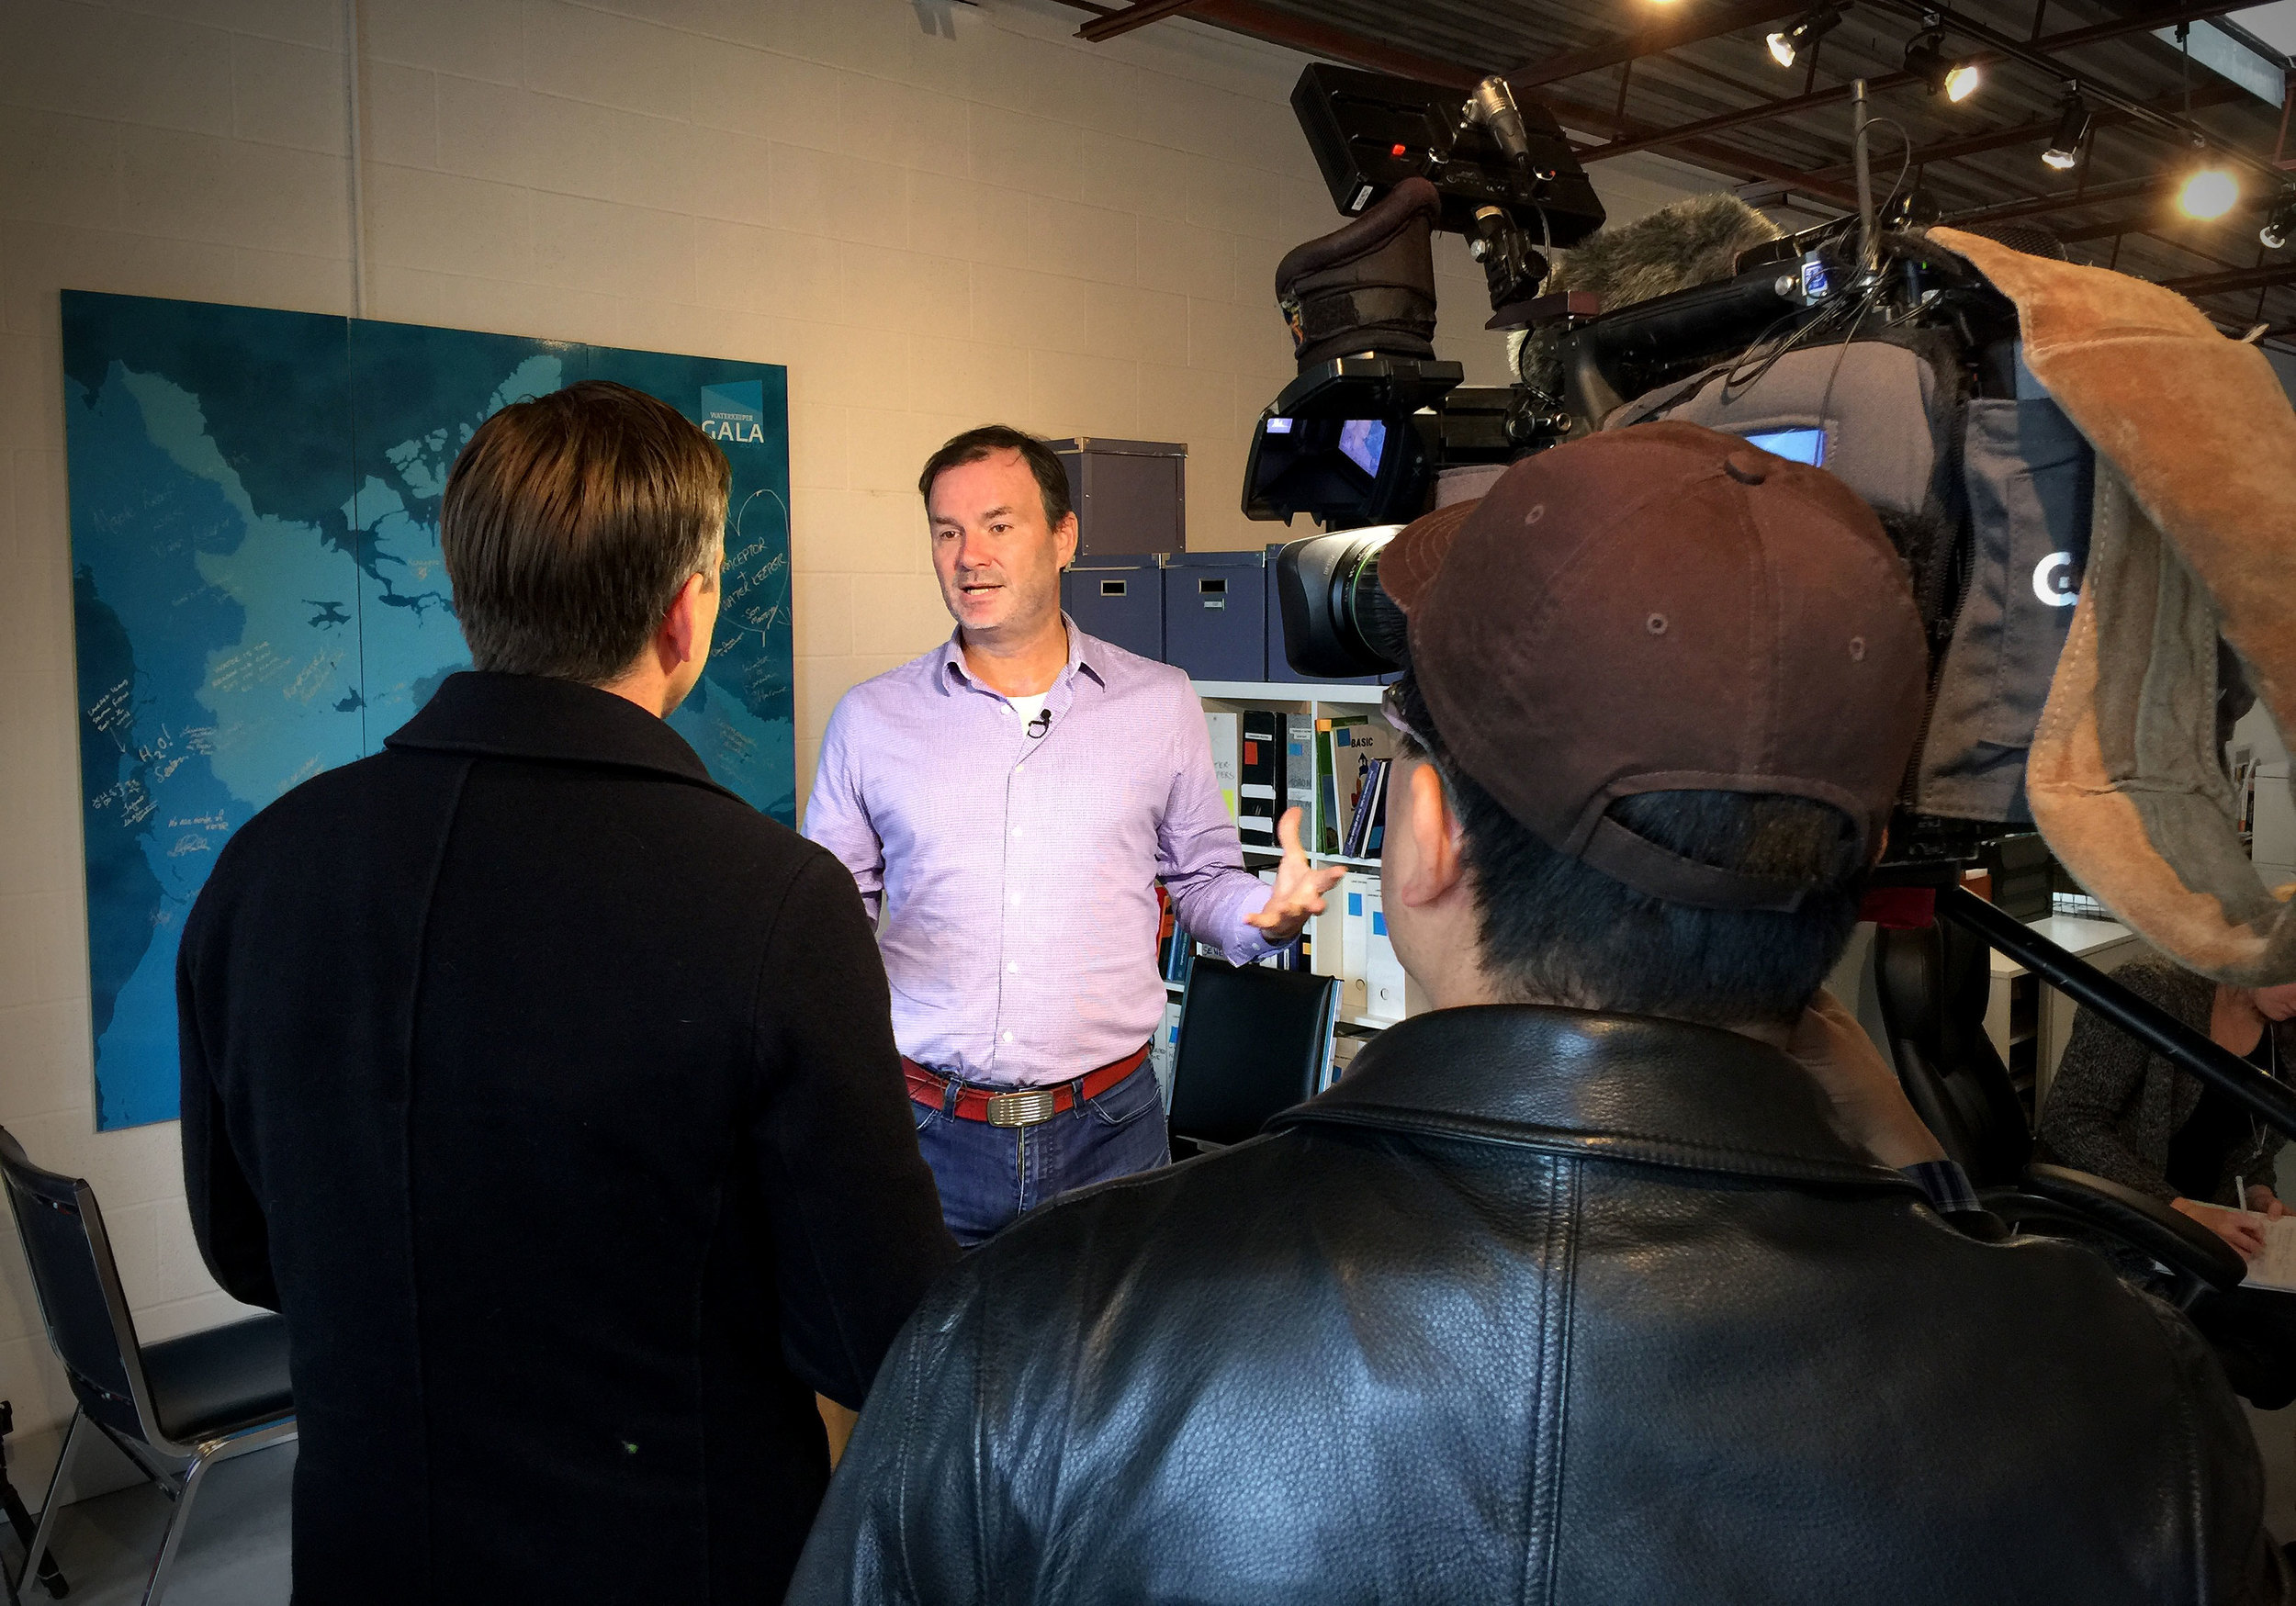 Global News Toronto's Mark McAllister interviewing Waterkeeper Mark Mattson at the Waterkeeper office. (Photo via Lake Ontario Waterkeeper)